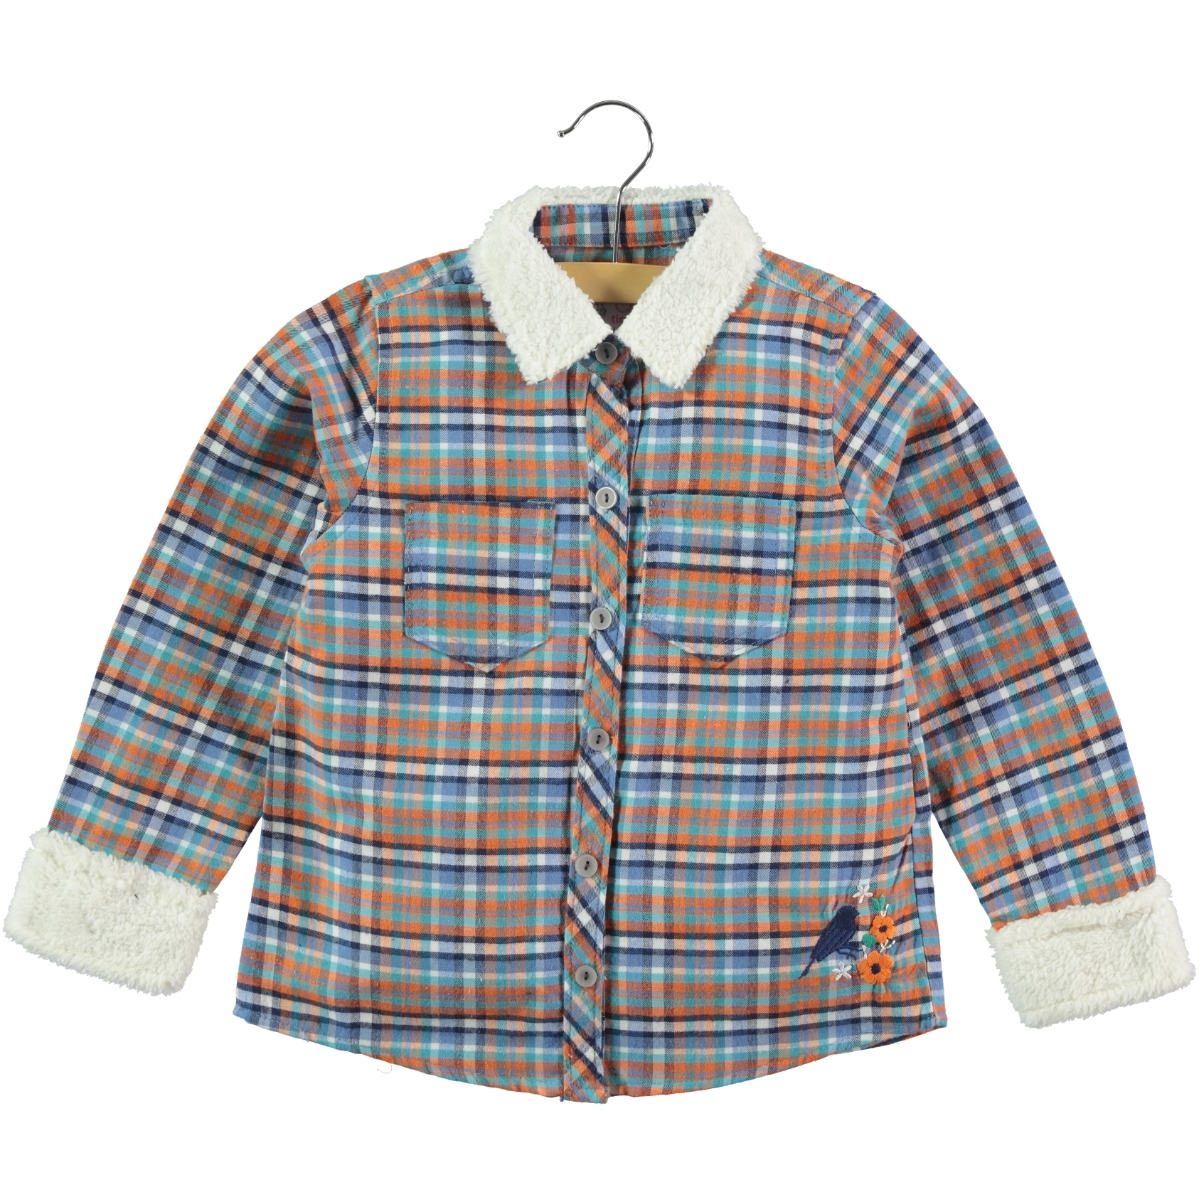 Timo Orange Shirt Boy Girl Age 6-9